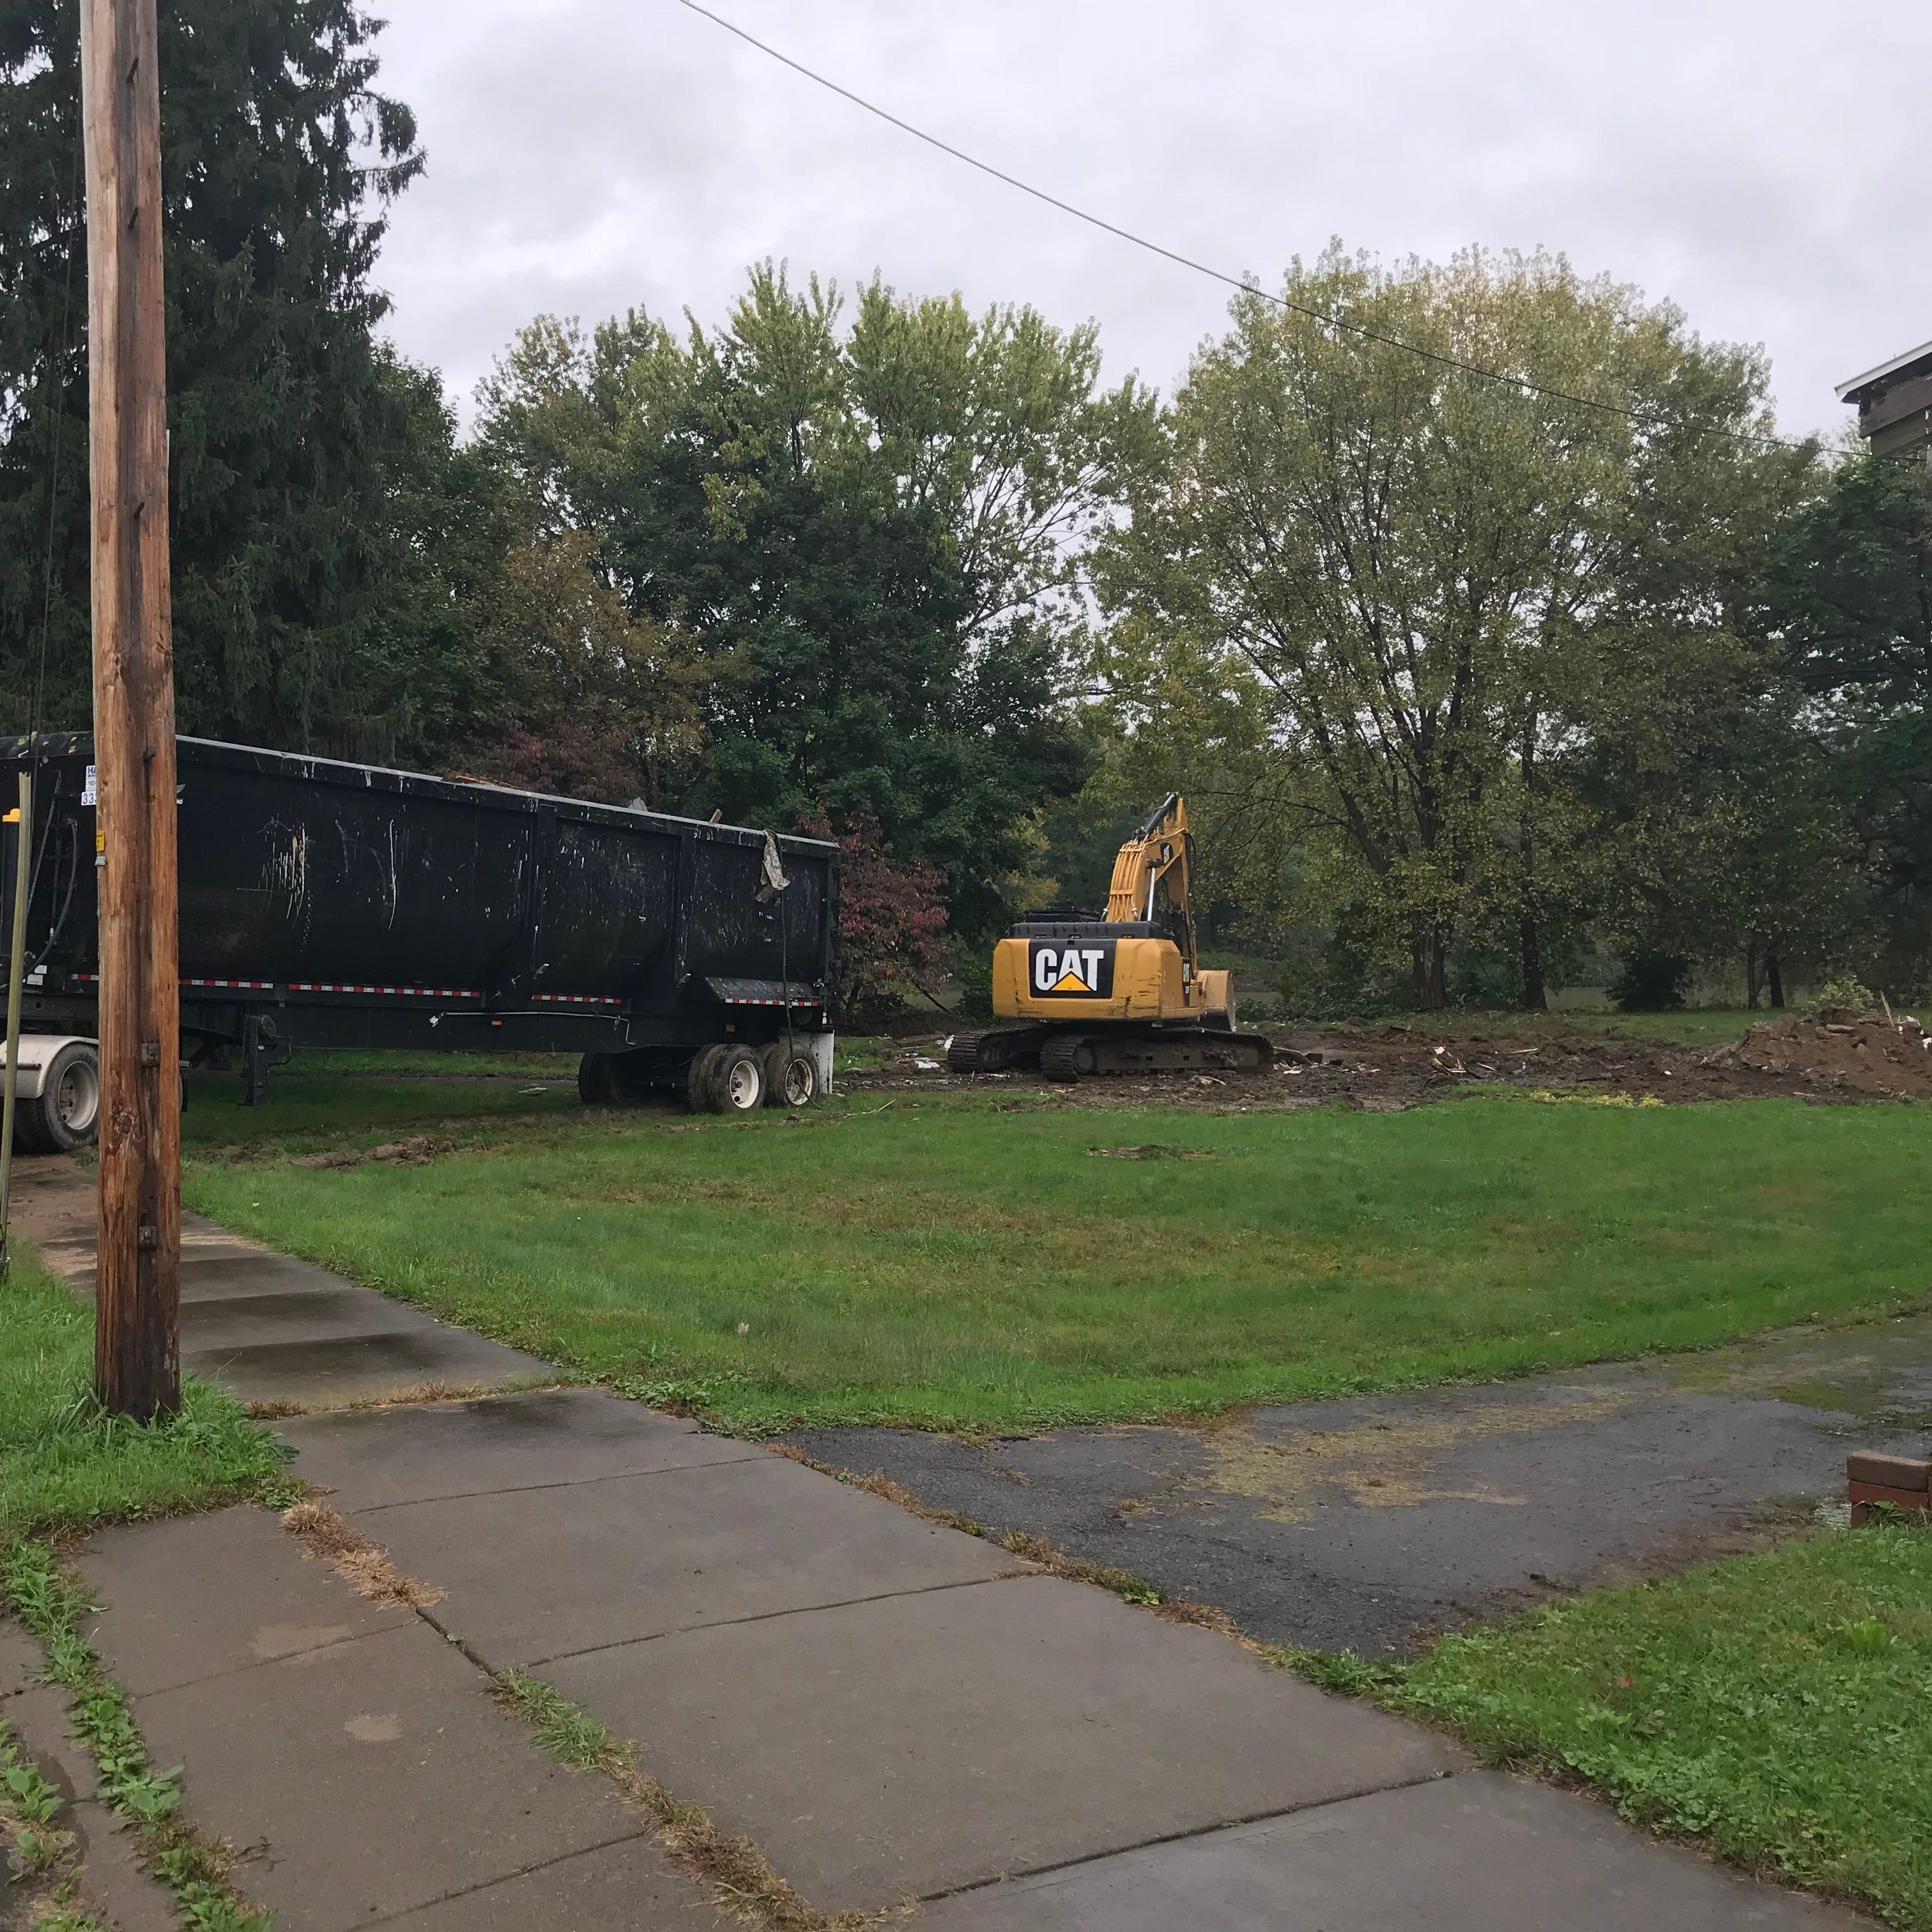 14 flood-prone properties in Binghamton to be demolished